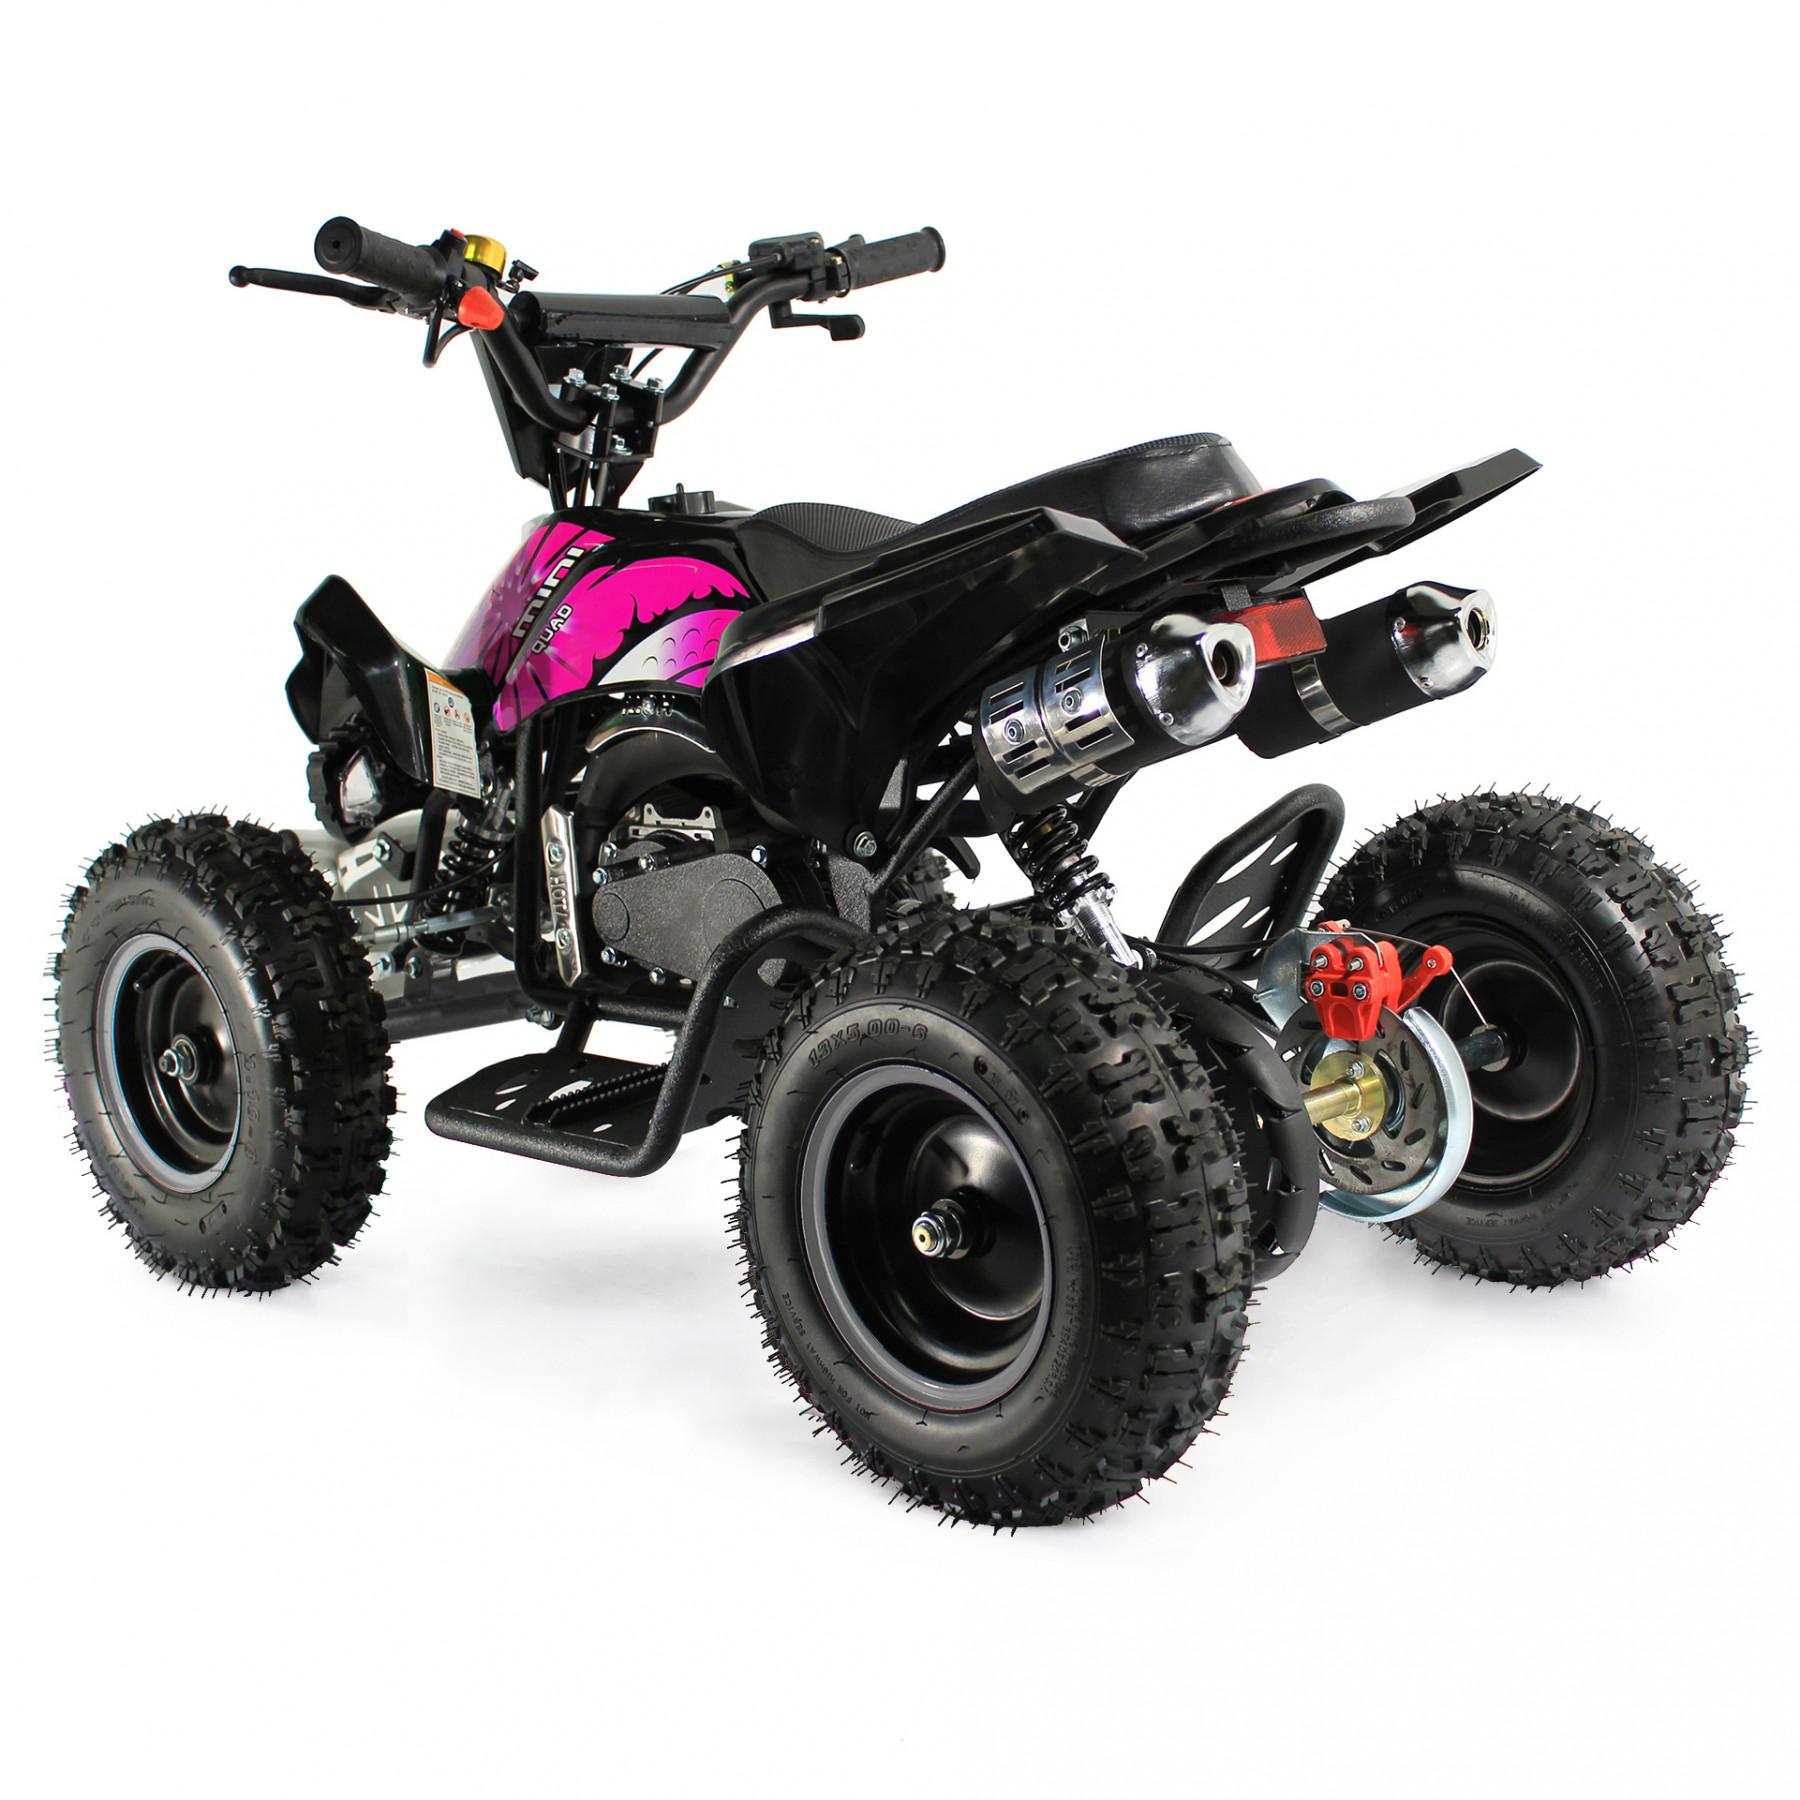 XTM MONSTER 50cc QUAD BIKE BLACK PINK